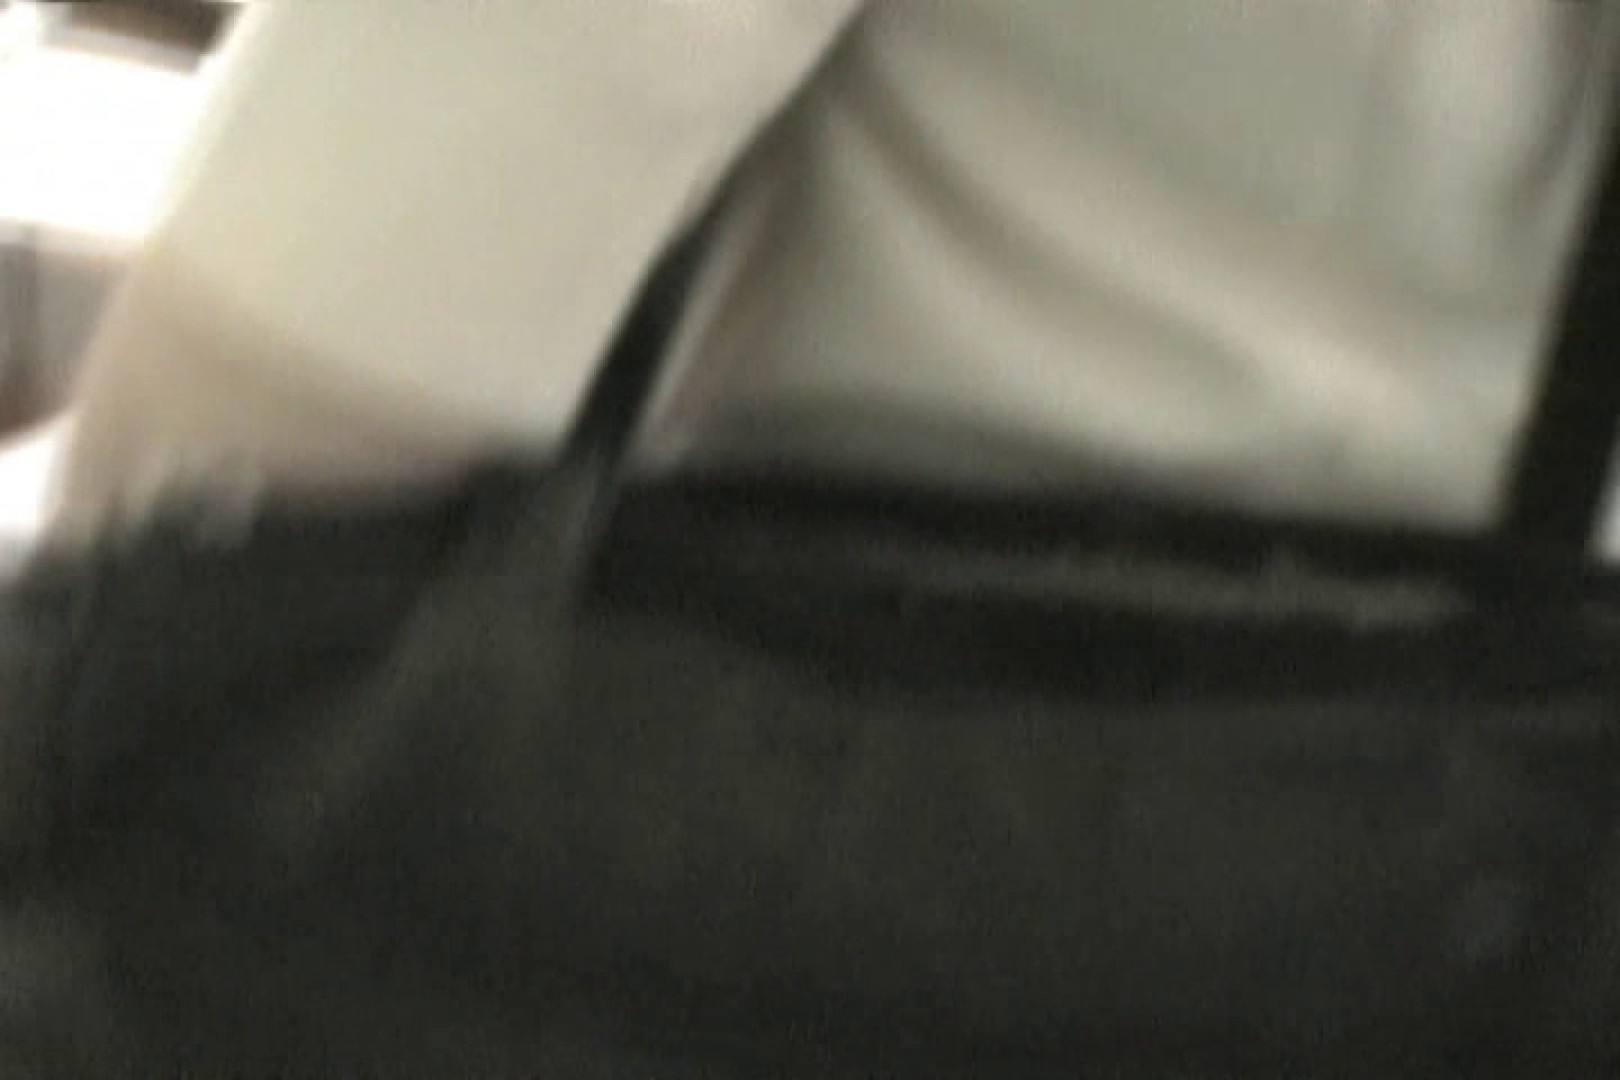 H大好き熟女と自宅でハメ撮り~中原まりこ~ 熟女のエロ生活 スケベ動画紹介 110連発 68